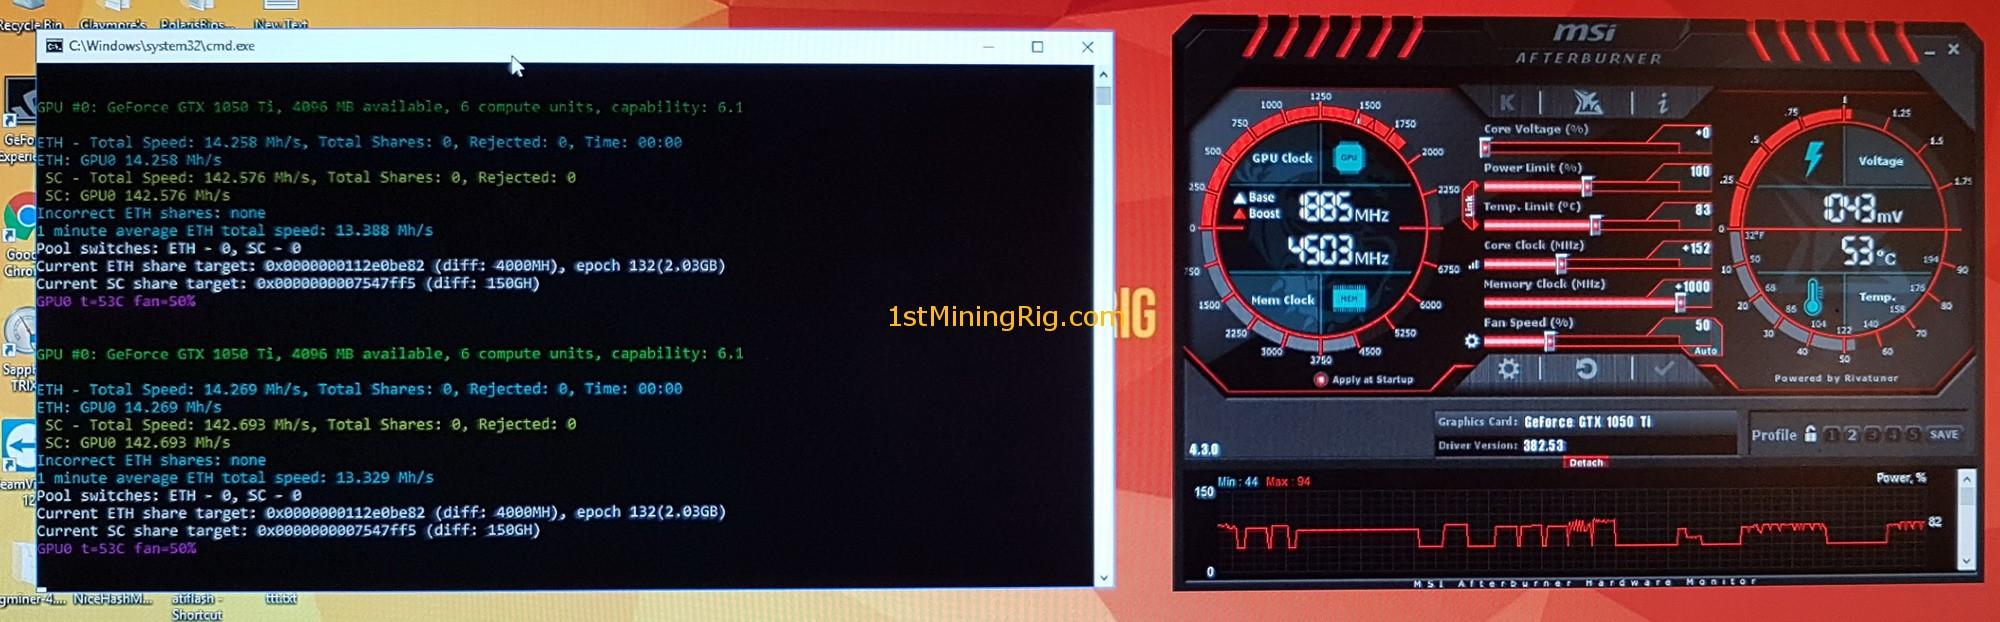 best cryptocurrency to mine using gtx 1060